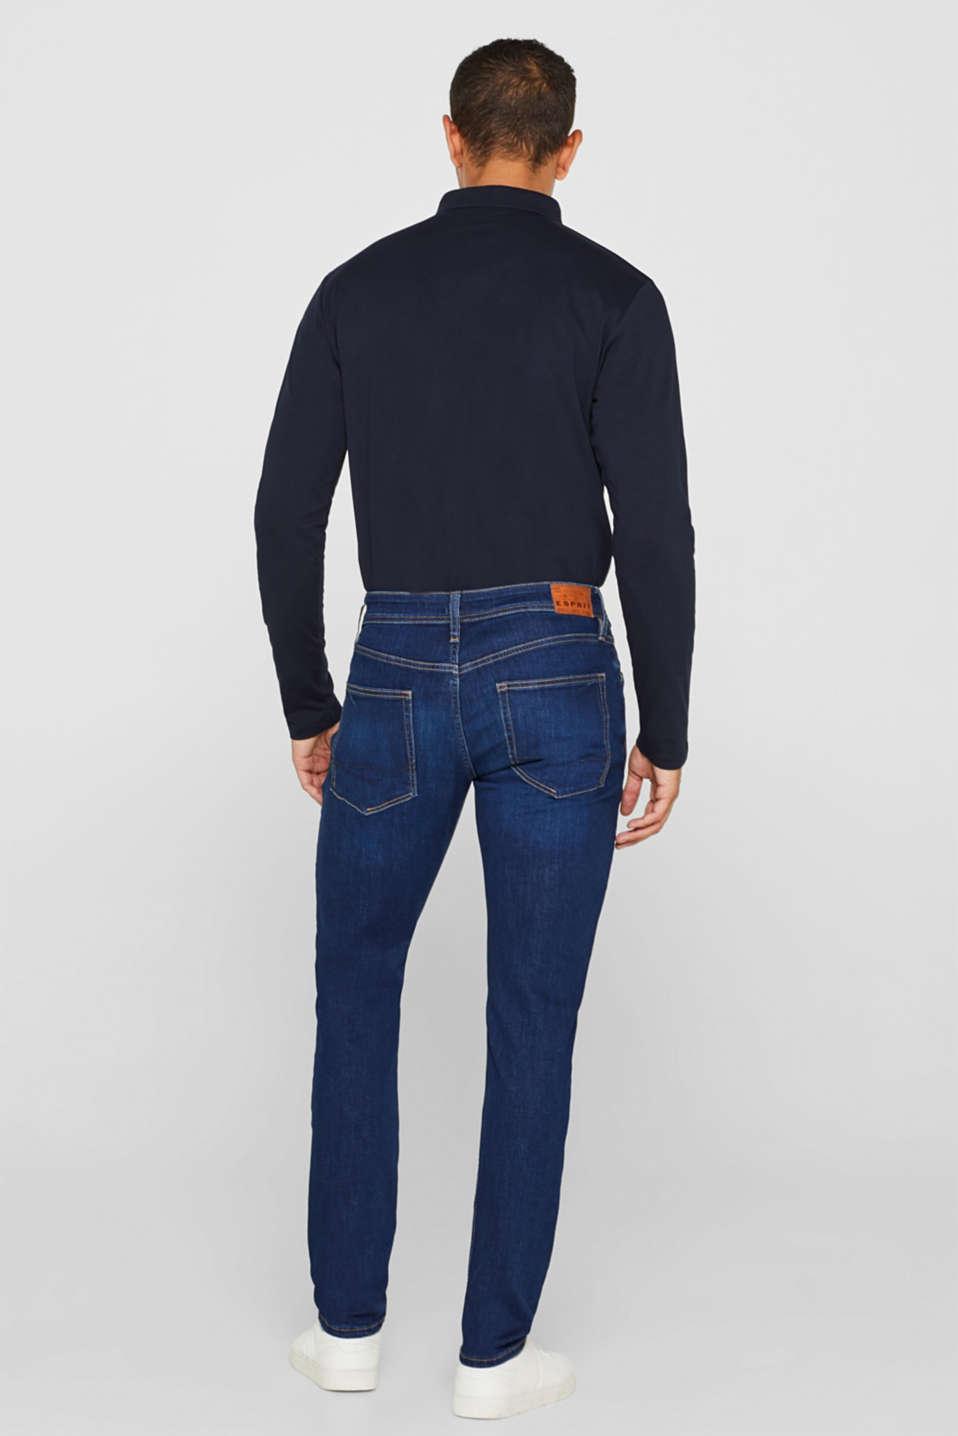 Pants denim, BLUE DARK WASH, detail image number 1